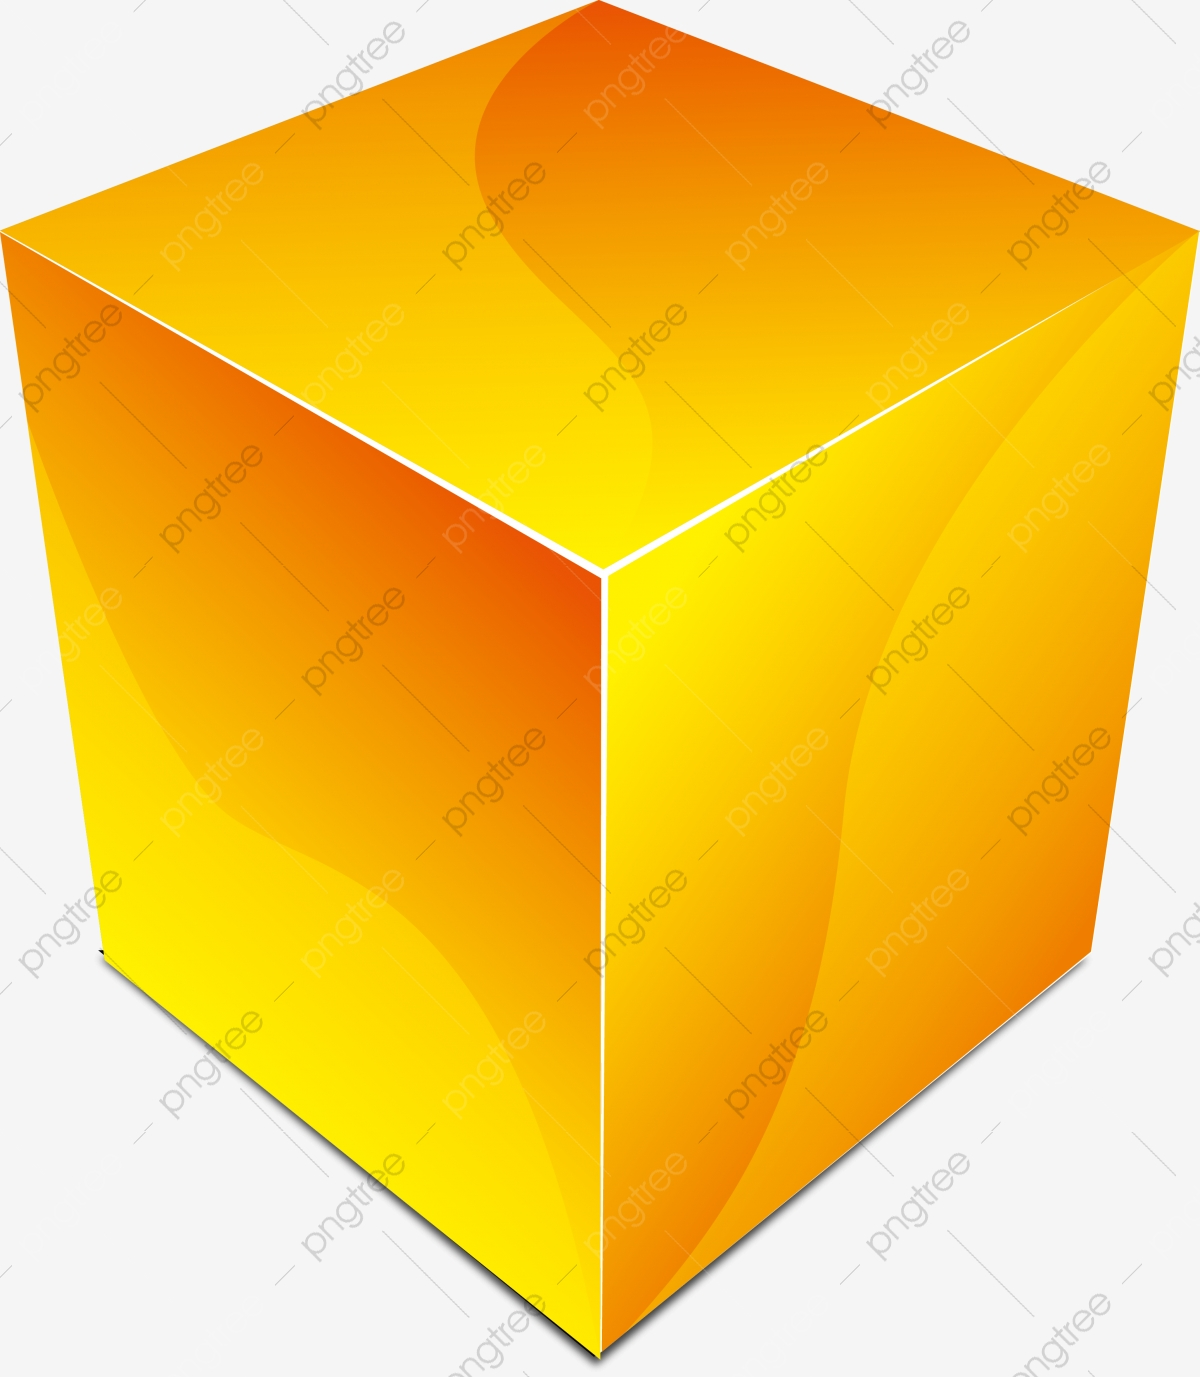 Yellow Cube Graphics, Geometric Cubic, Geometric Figure, Cube PNG.